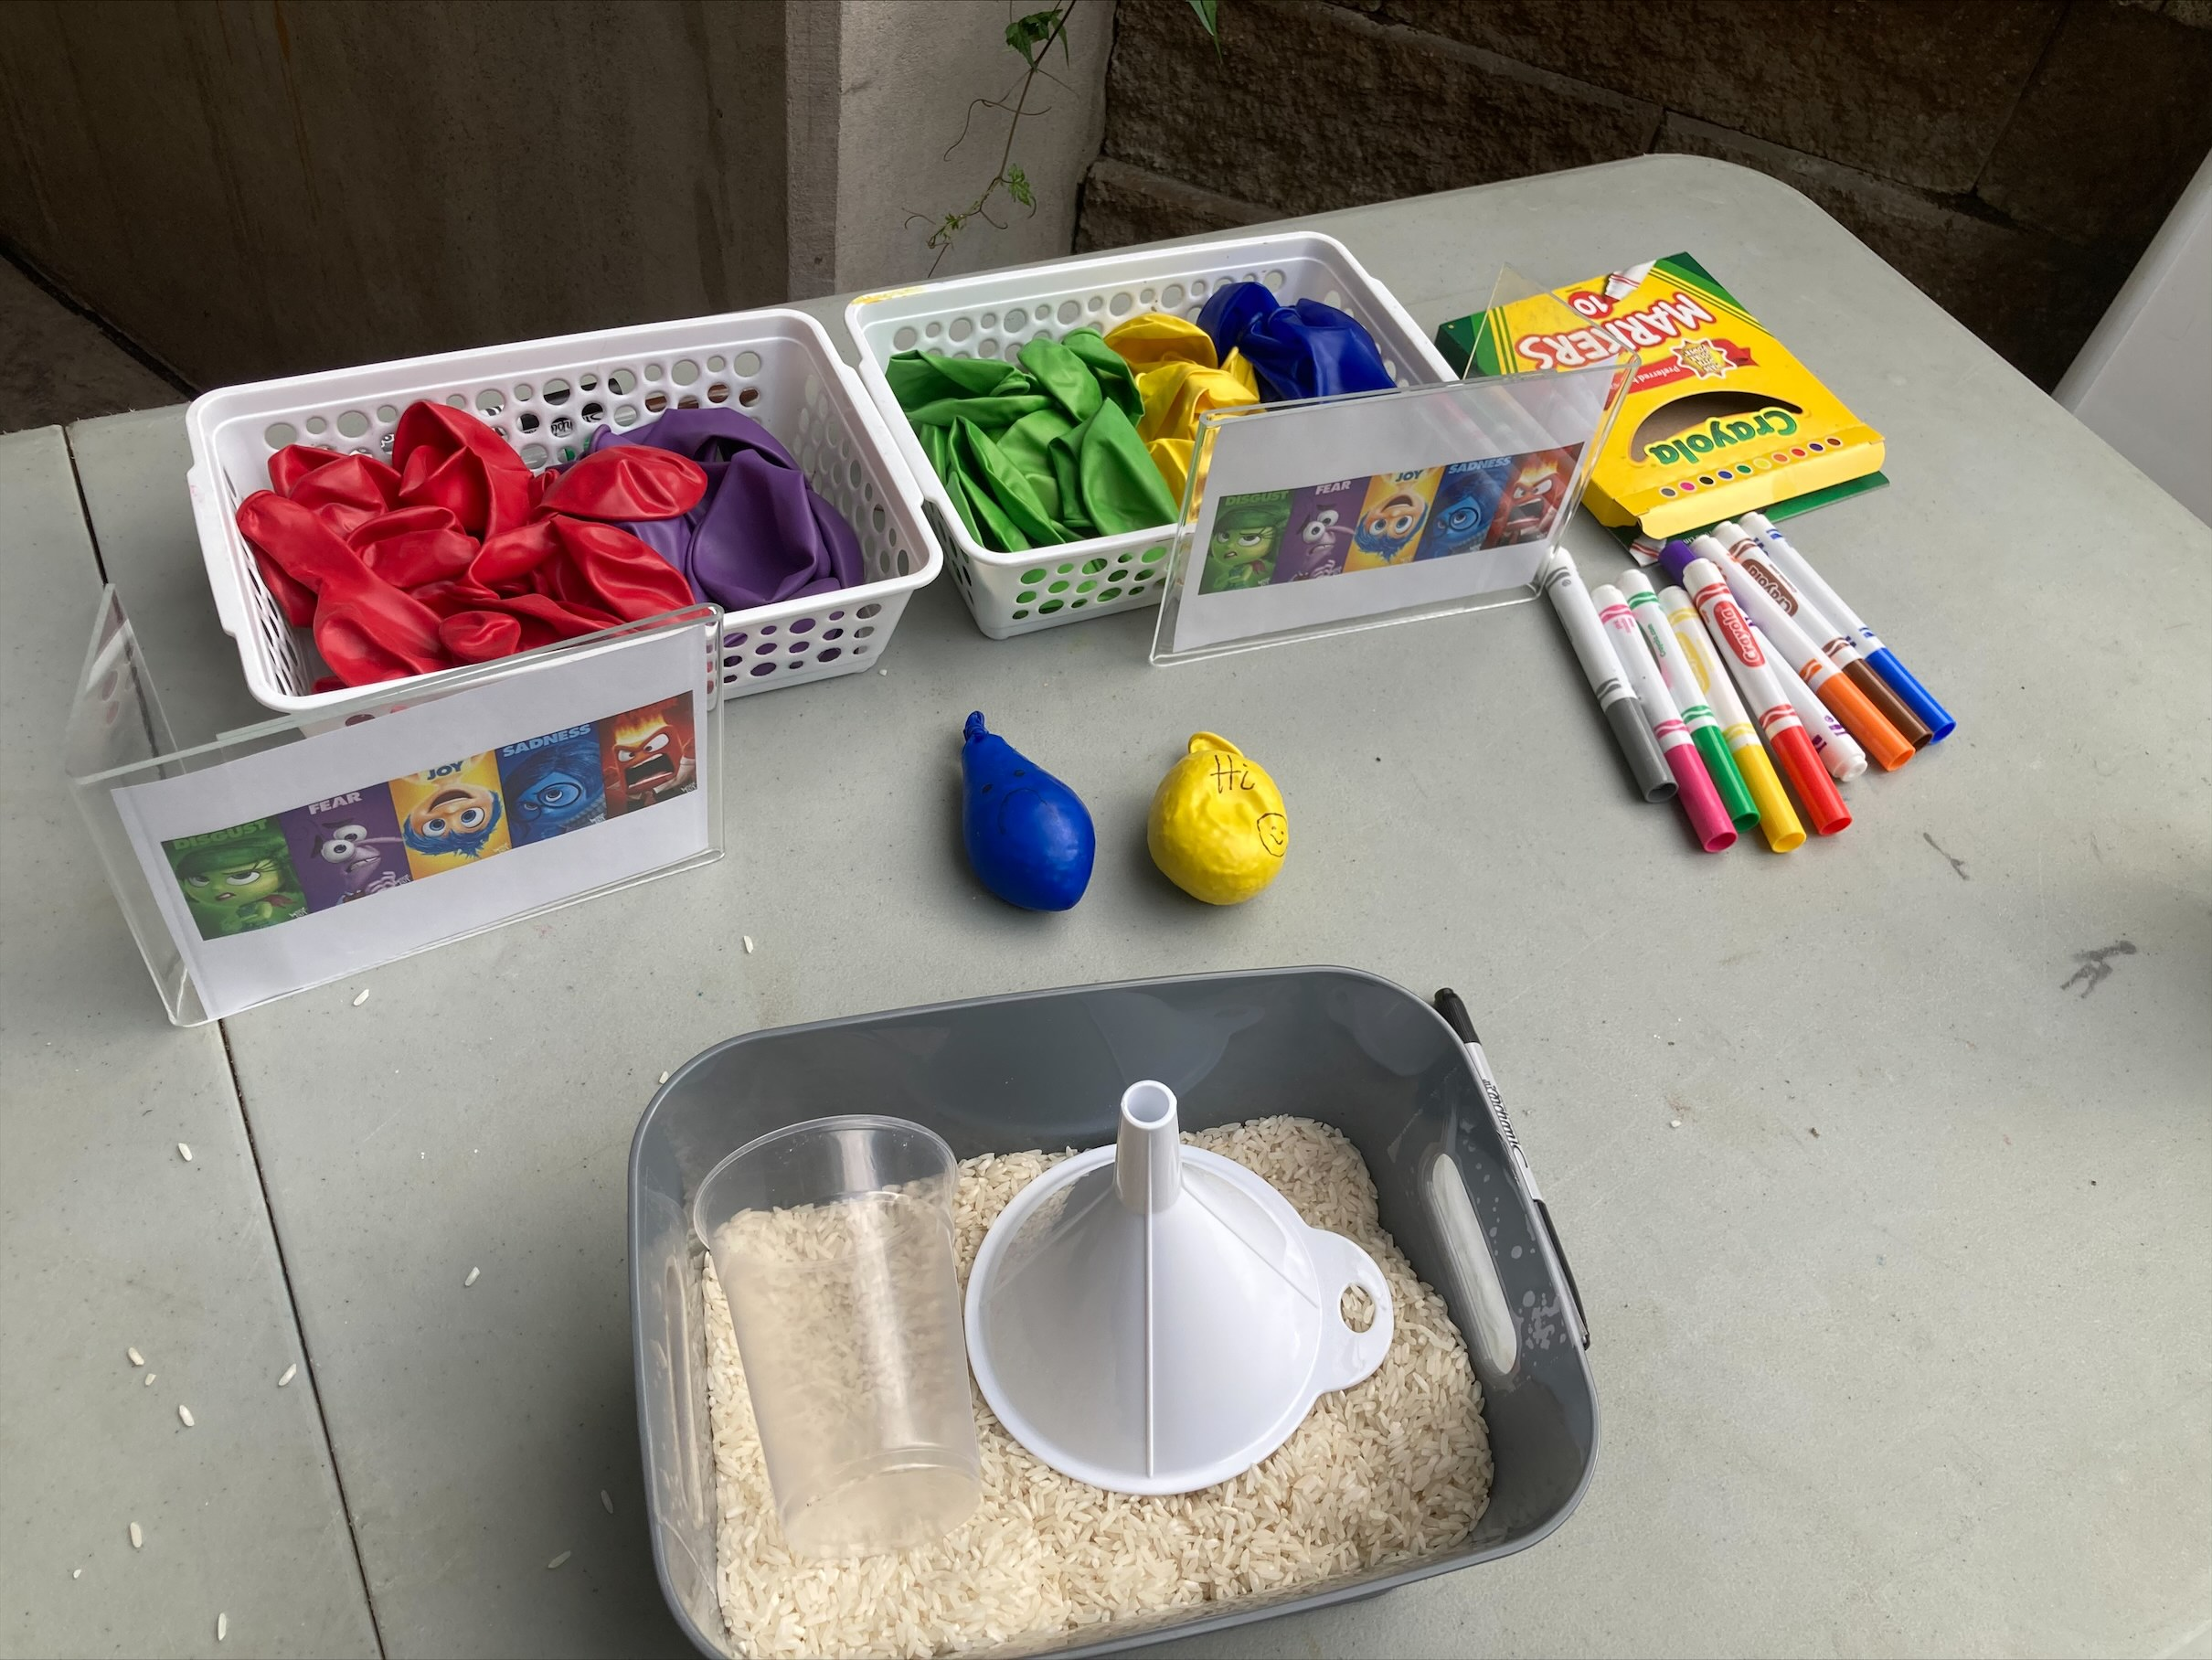 Materials to make stress balls.